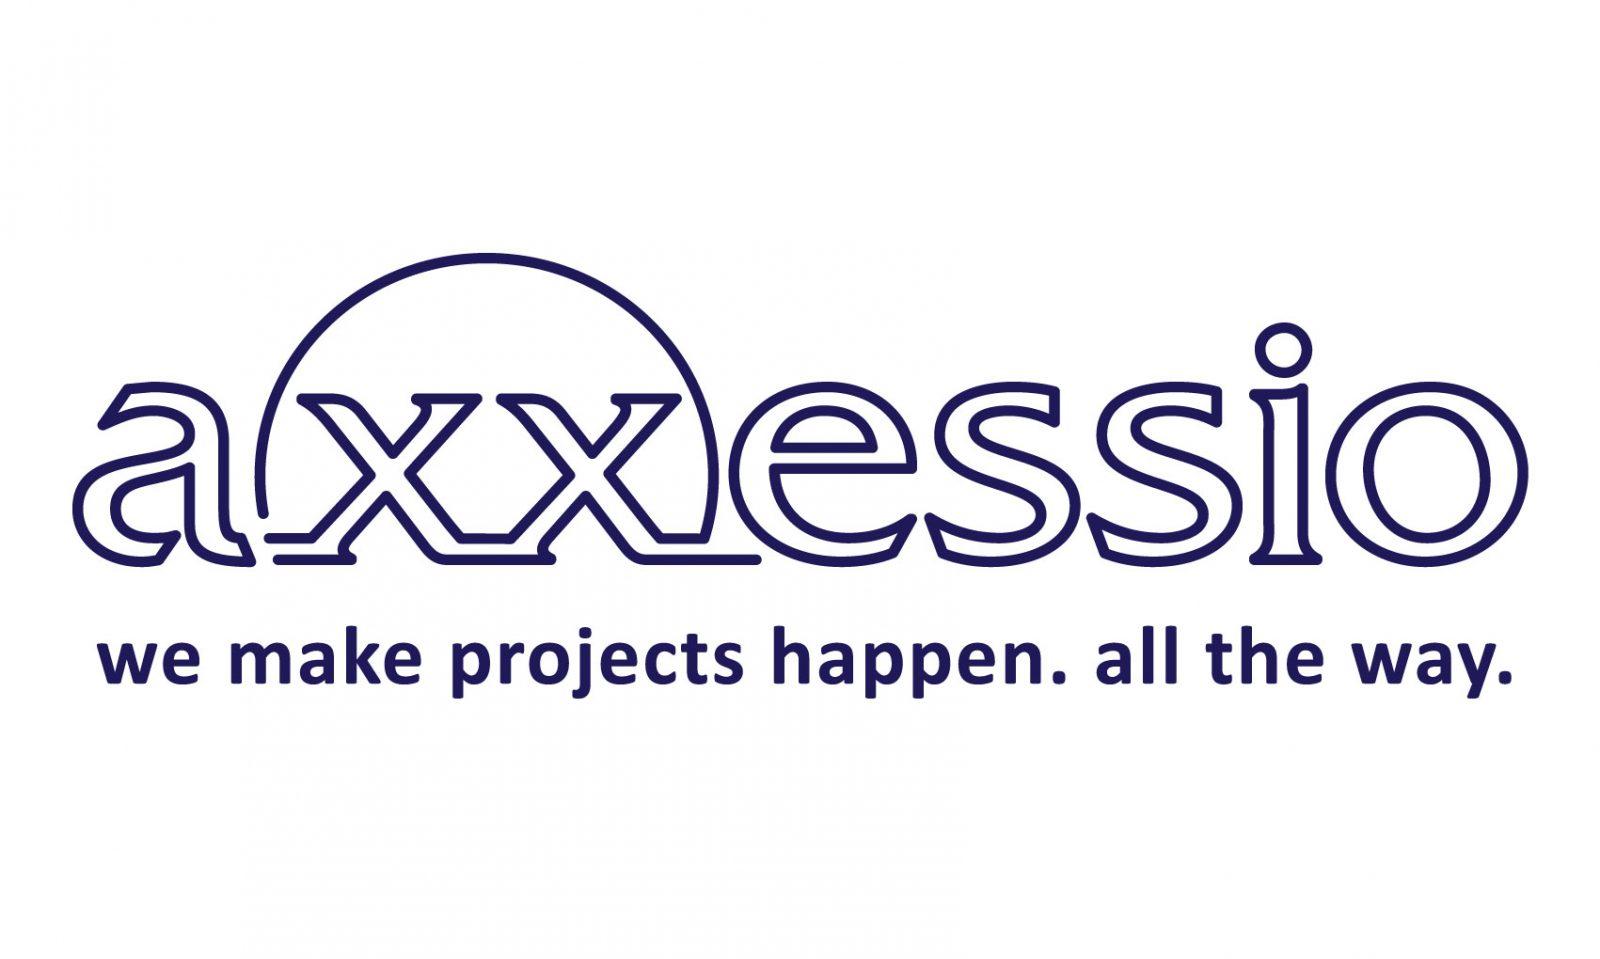 111031_axxessio_logo_claim_positiv_CMYK